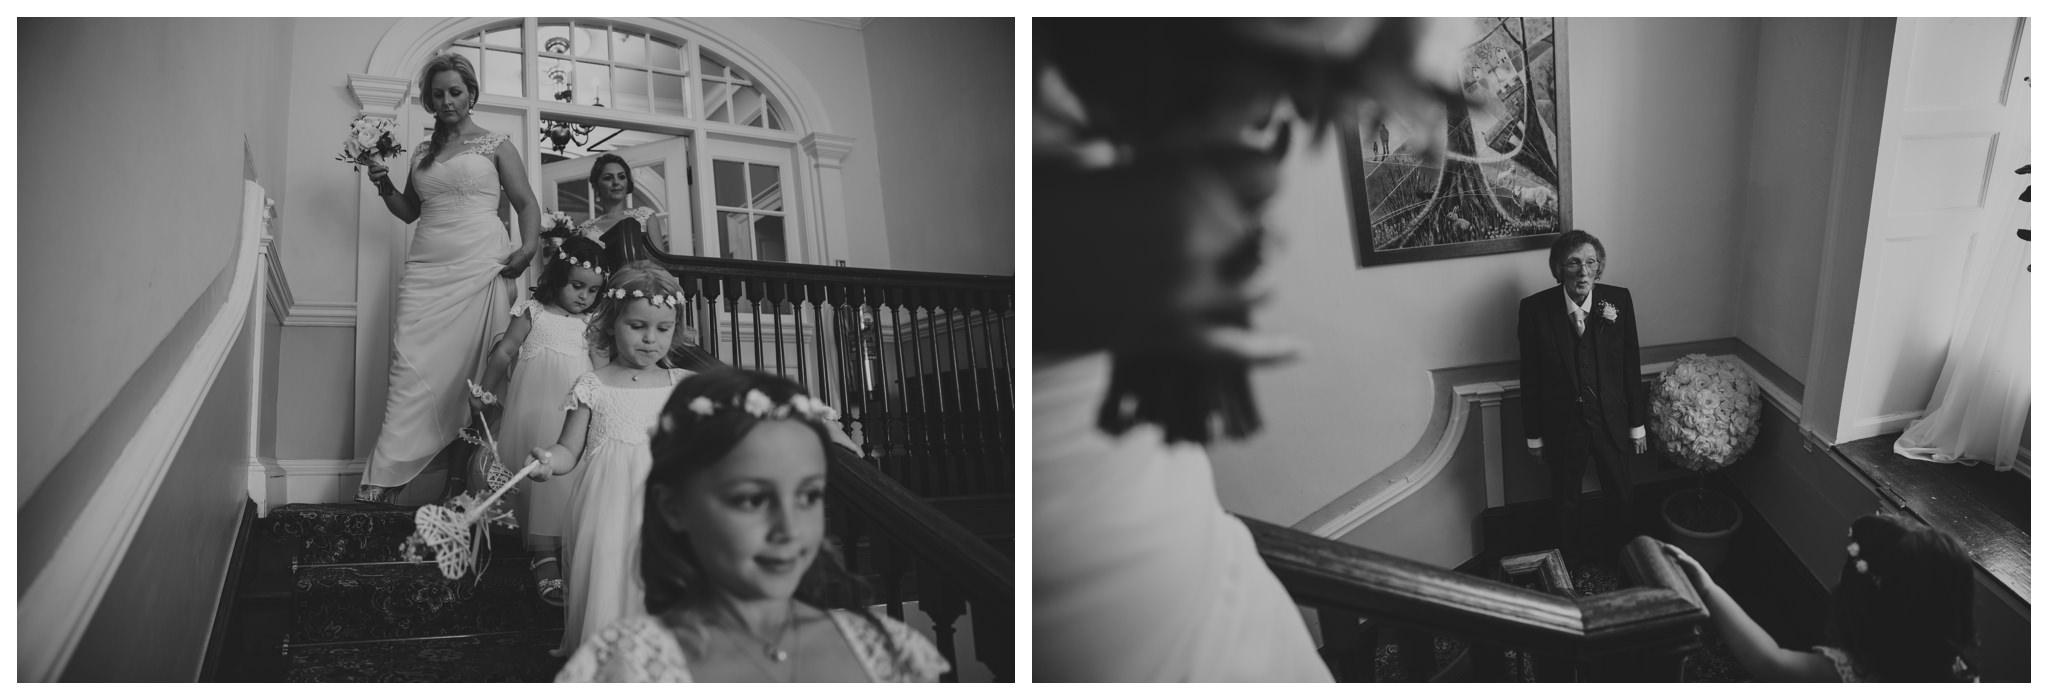 Richard Savage Photography - Wedding - Peterstone Court Brecon - 2016-05-11_0018